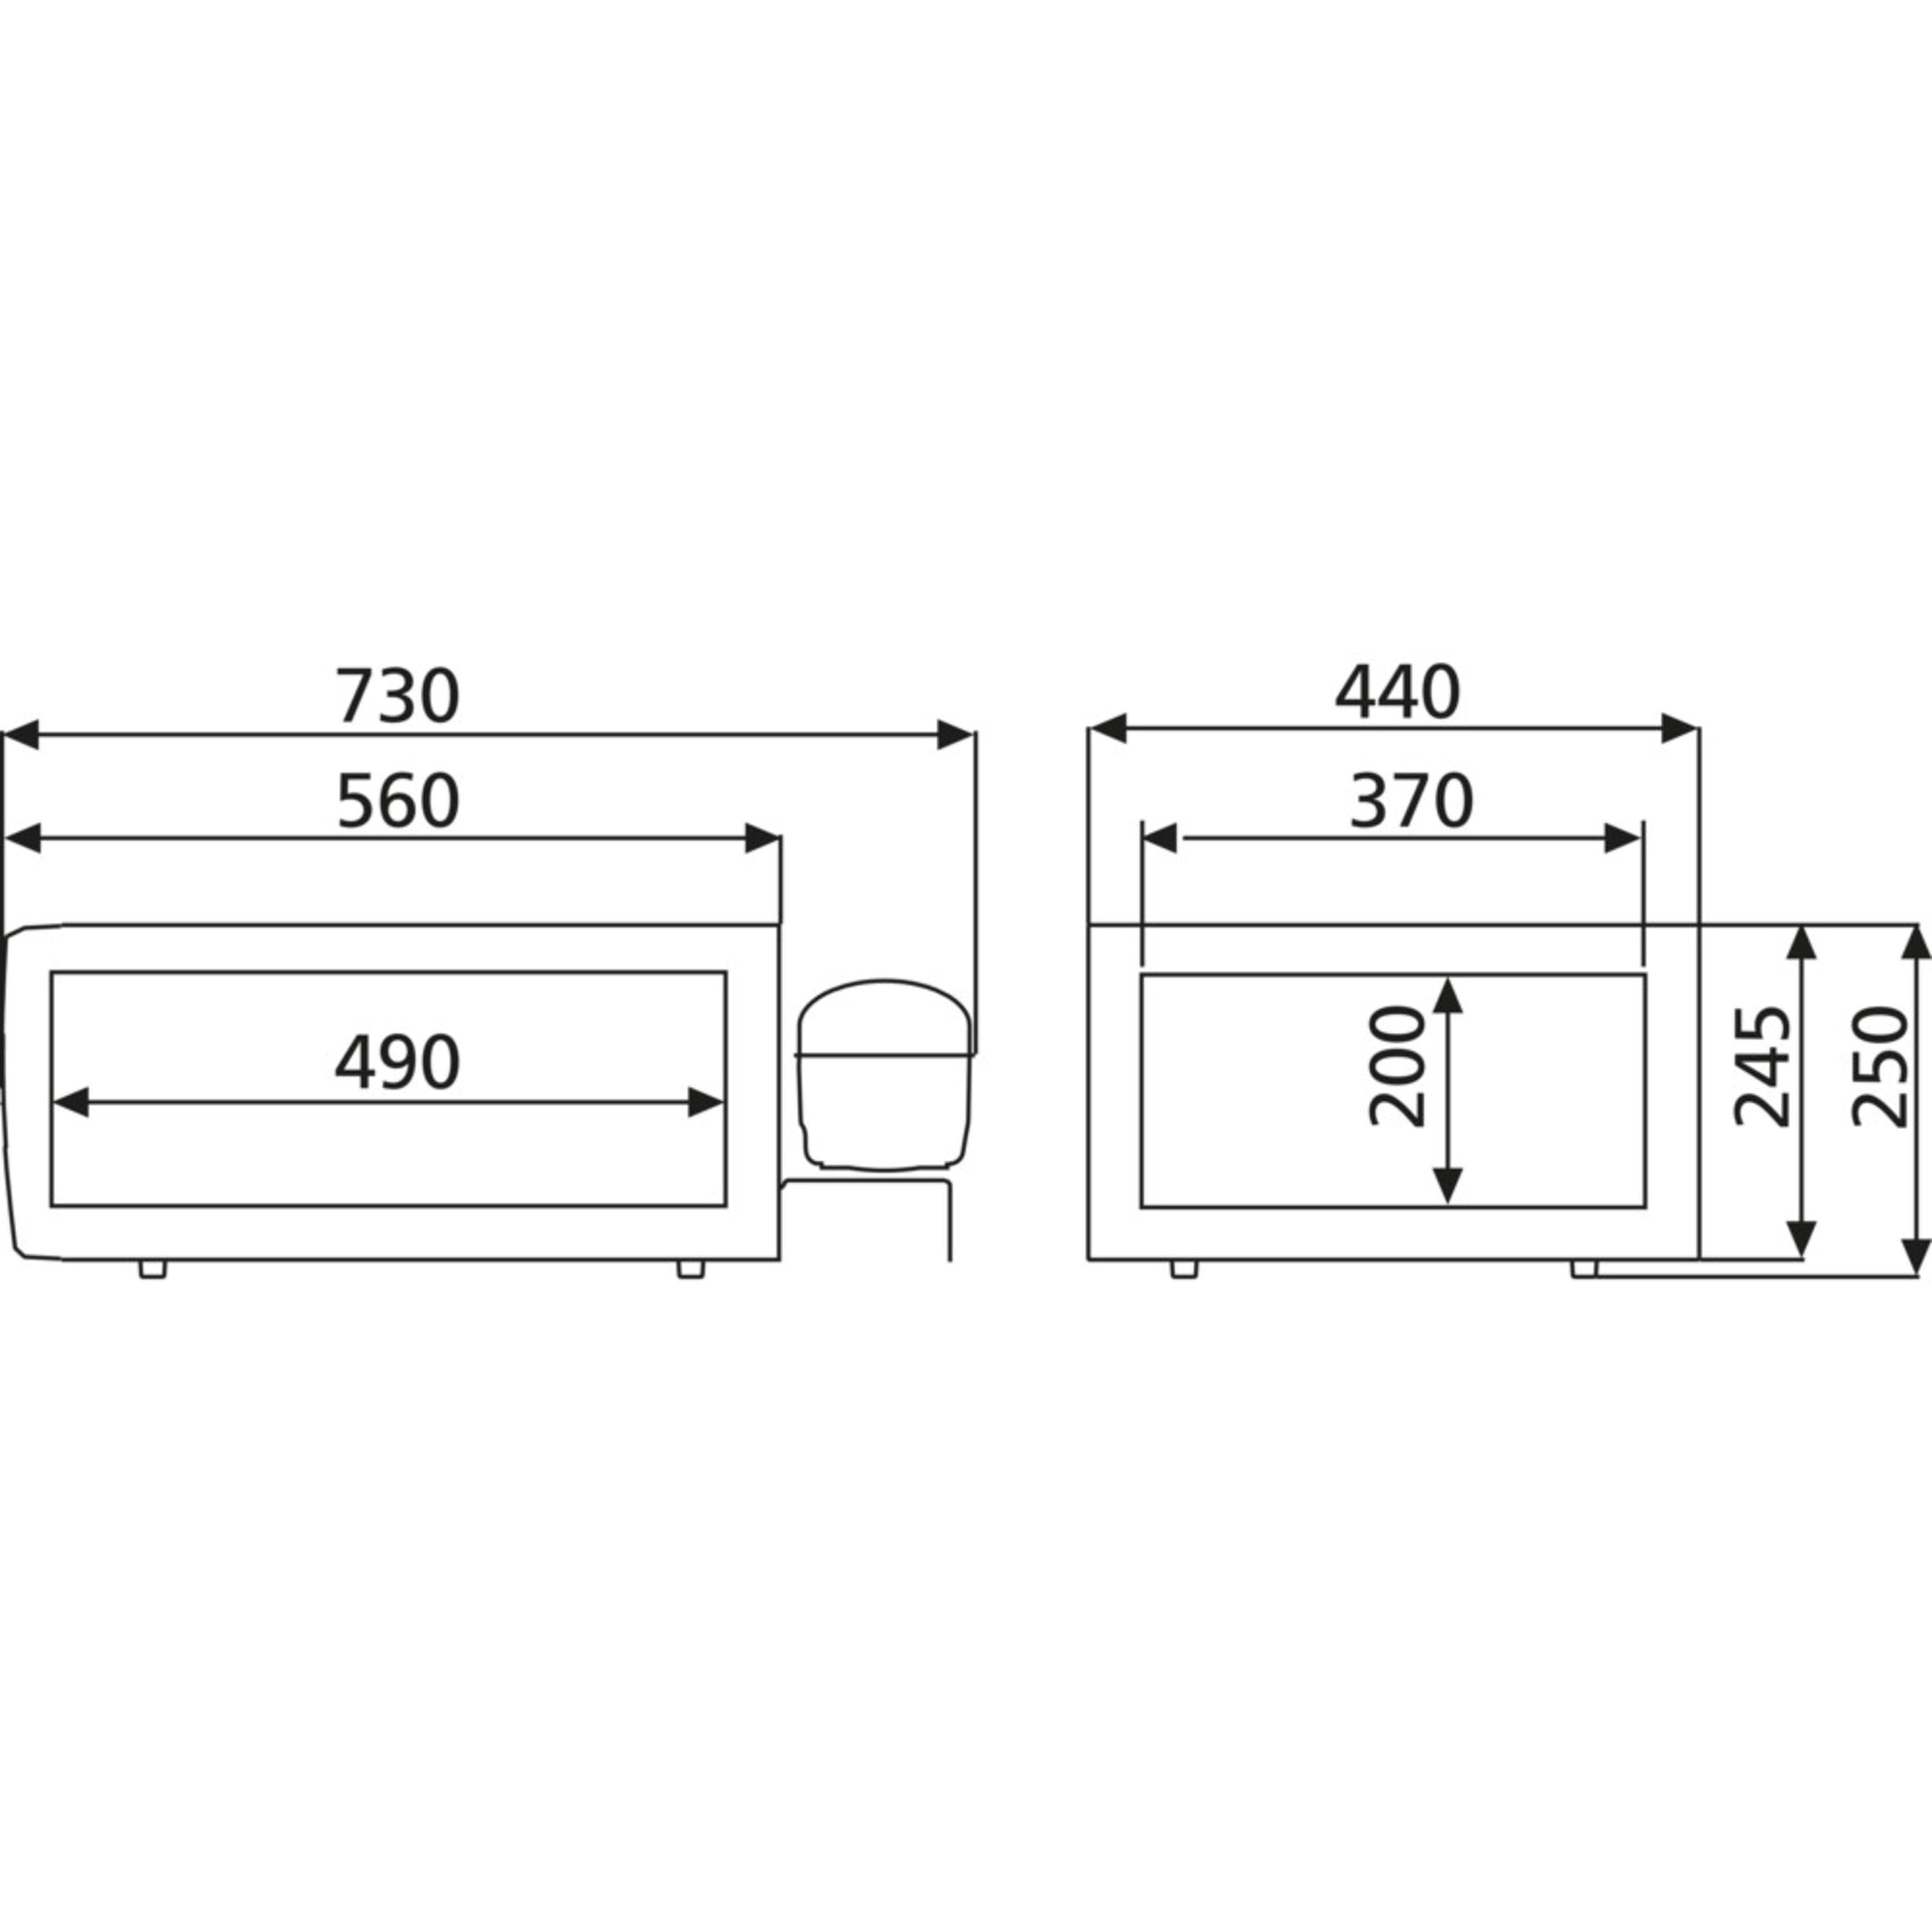 Dometic Rv Refrigerator Wiring Diagram